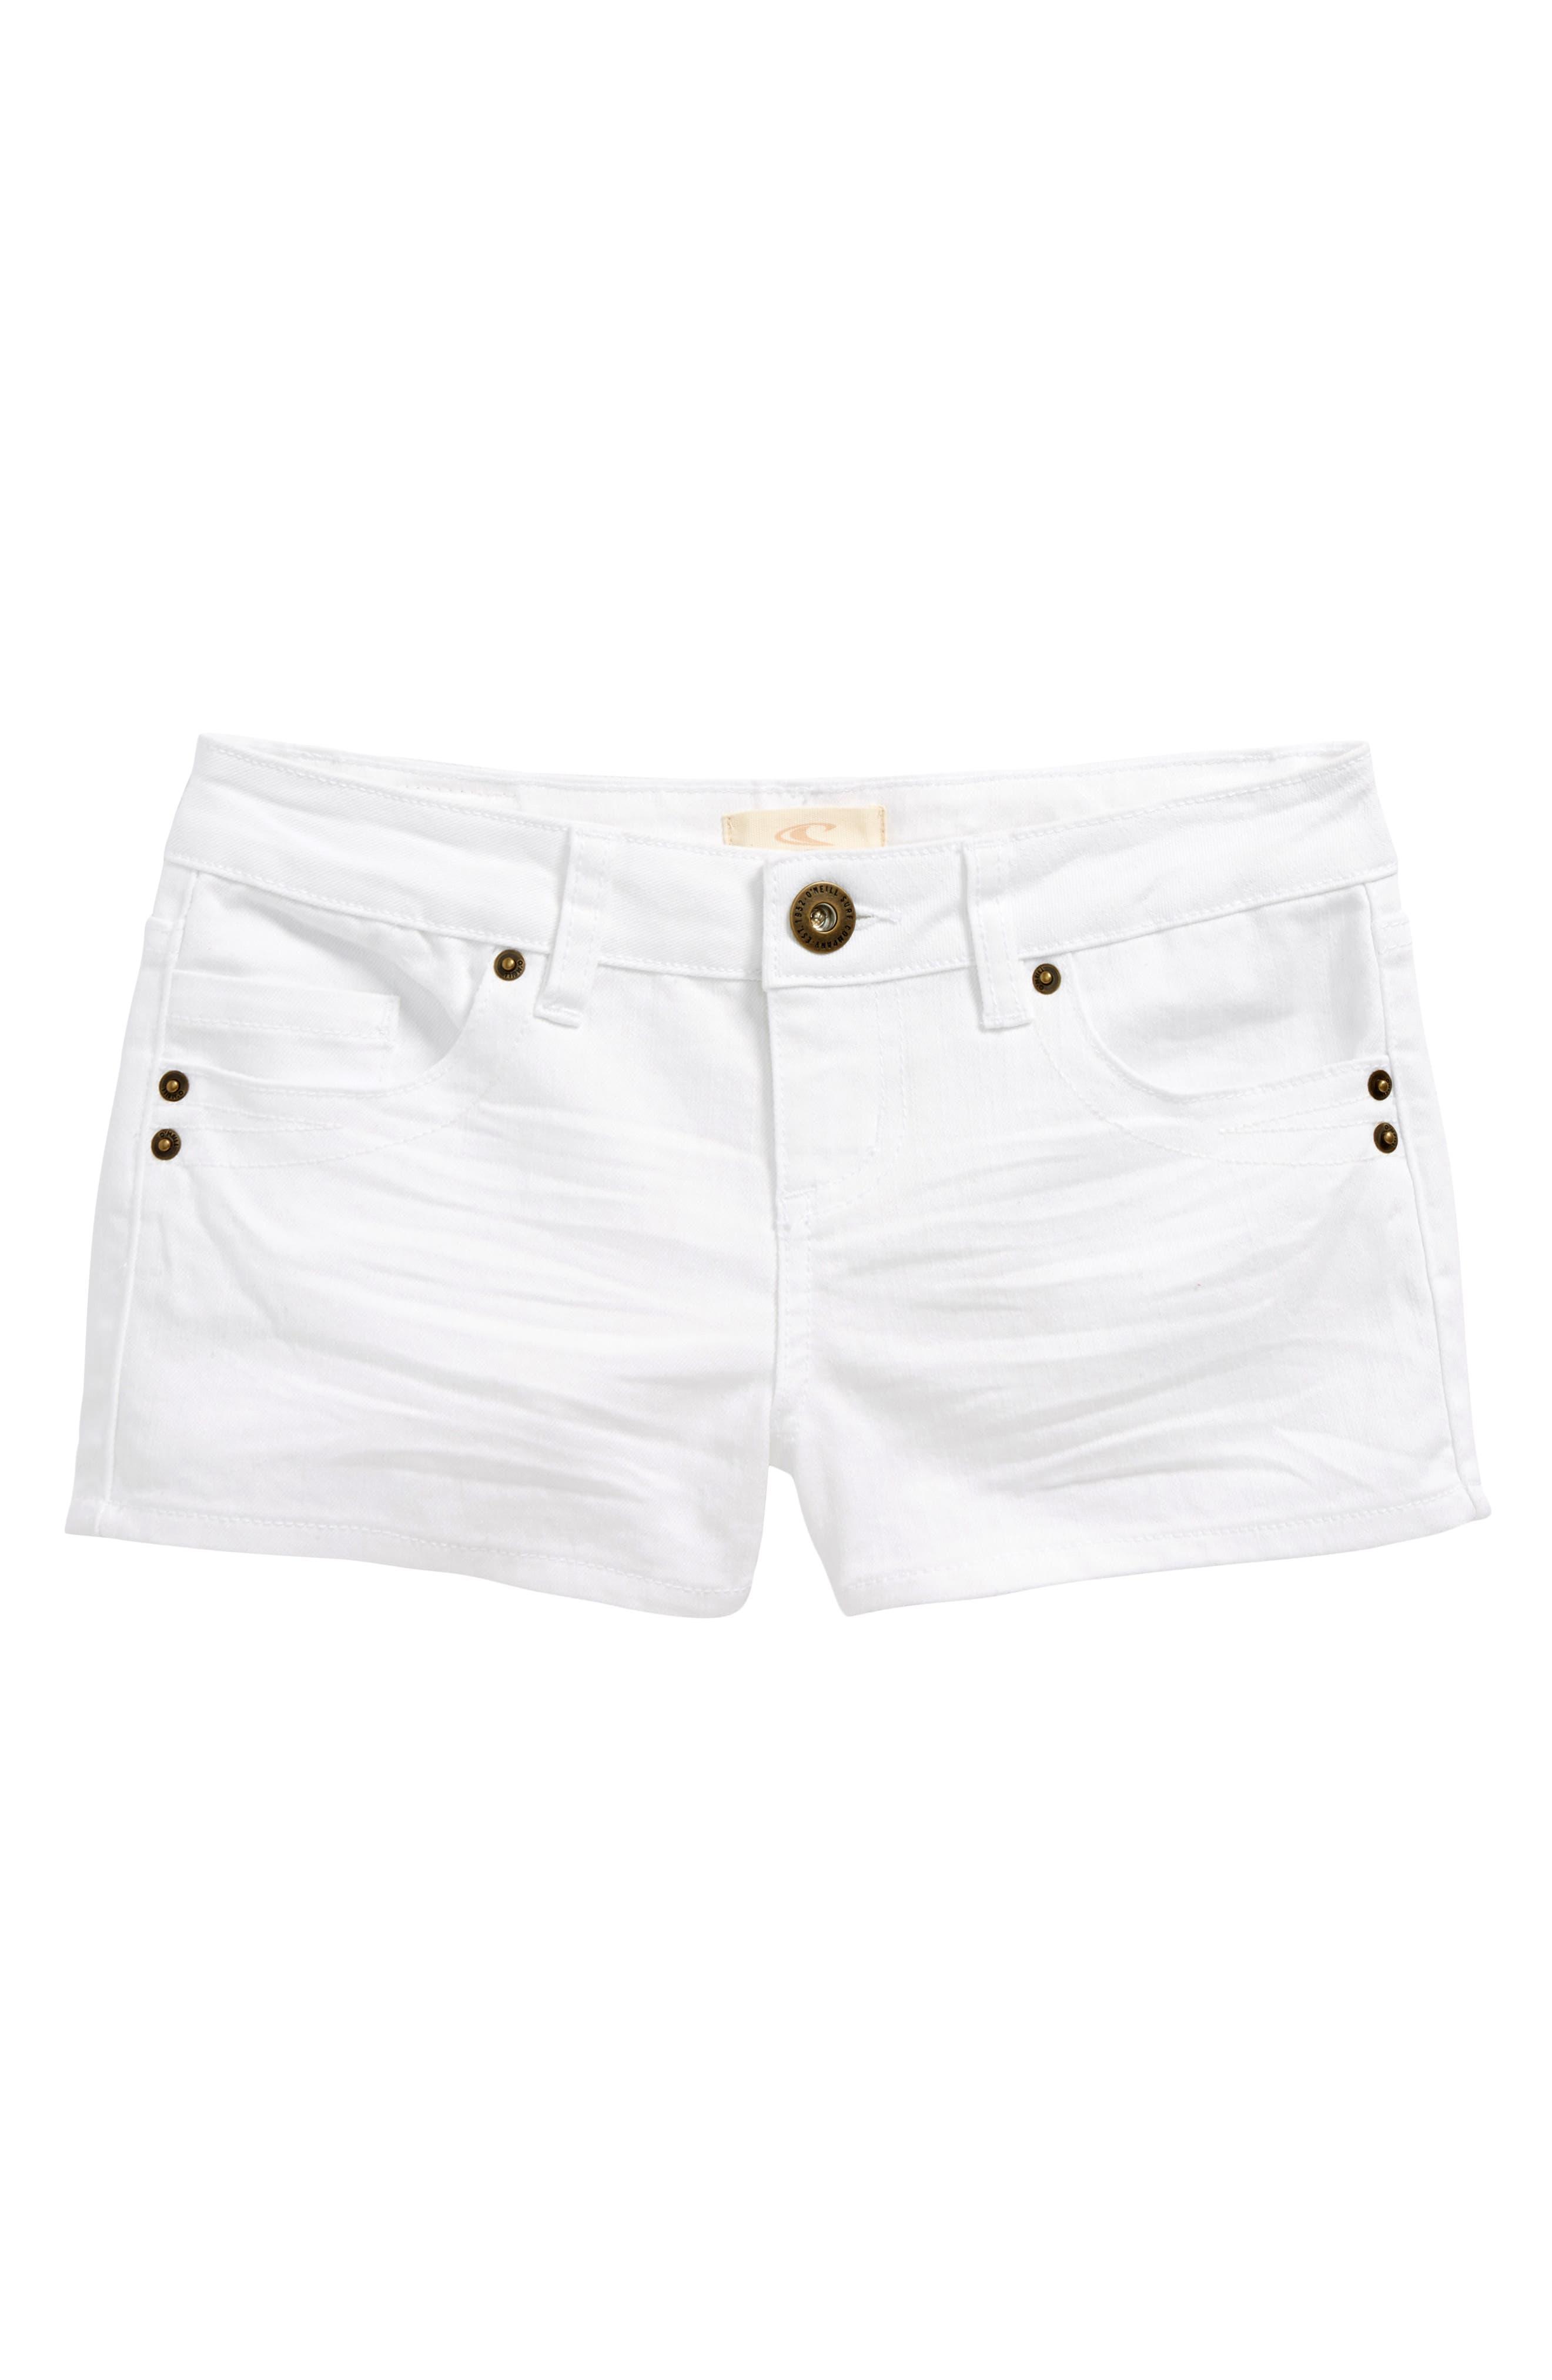 Waidley Denim Shorts,                         Main,                         color, 100